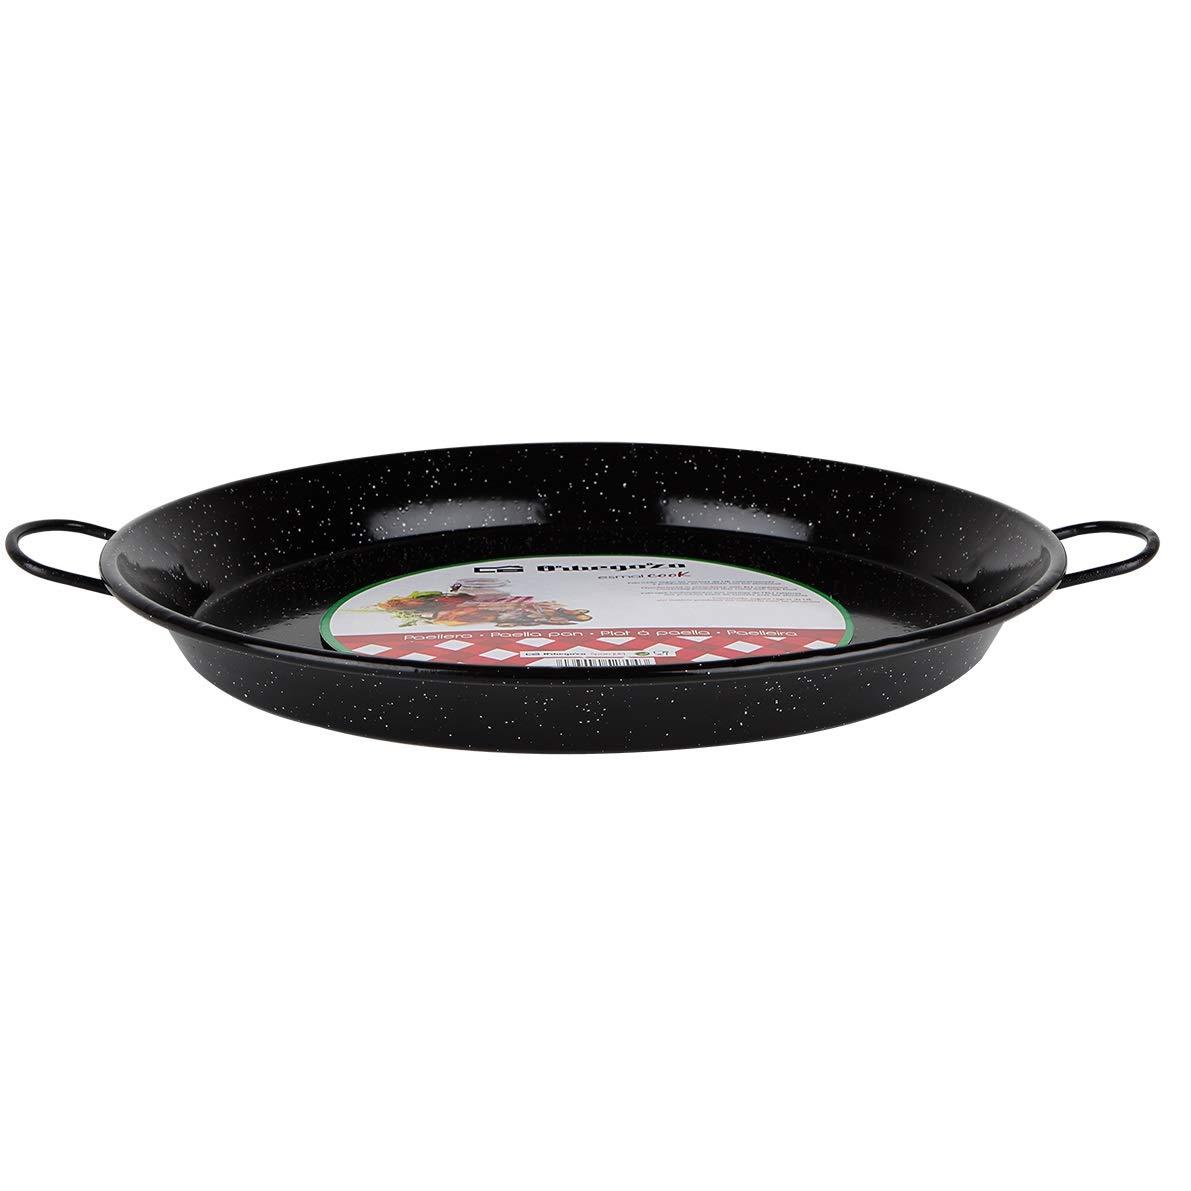 Orbegozo/ /Paella pan Di/ámetro 20 cm Black